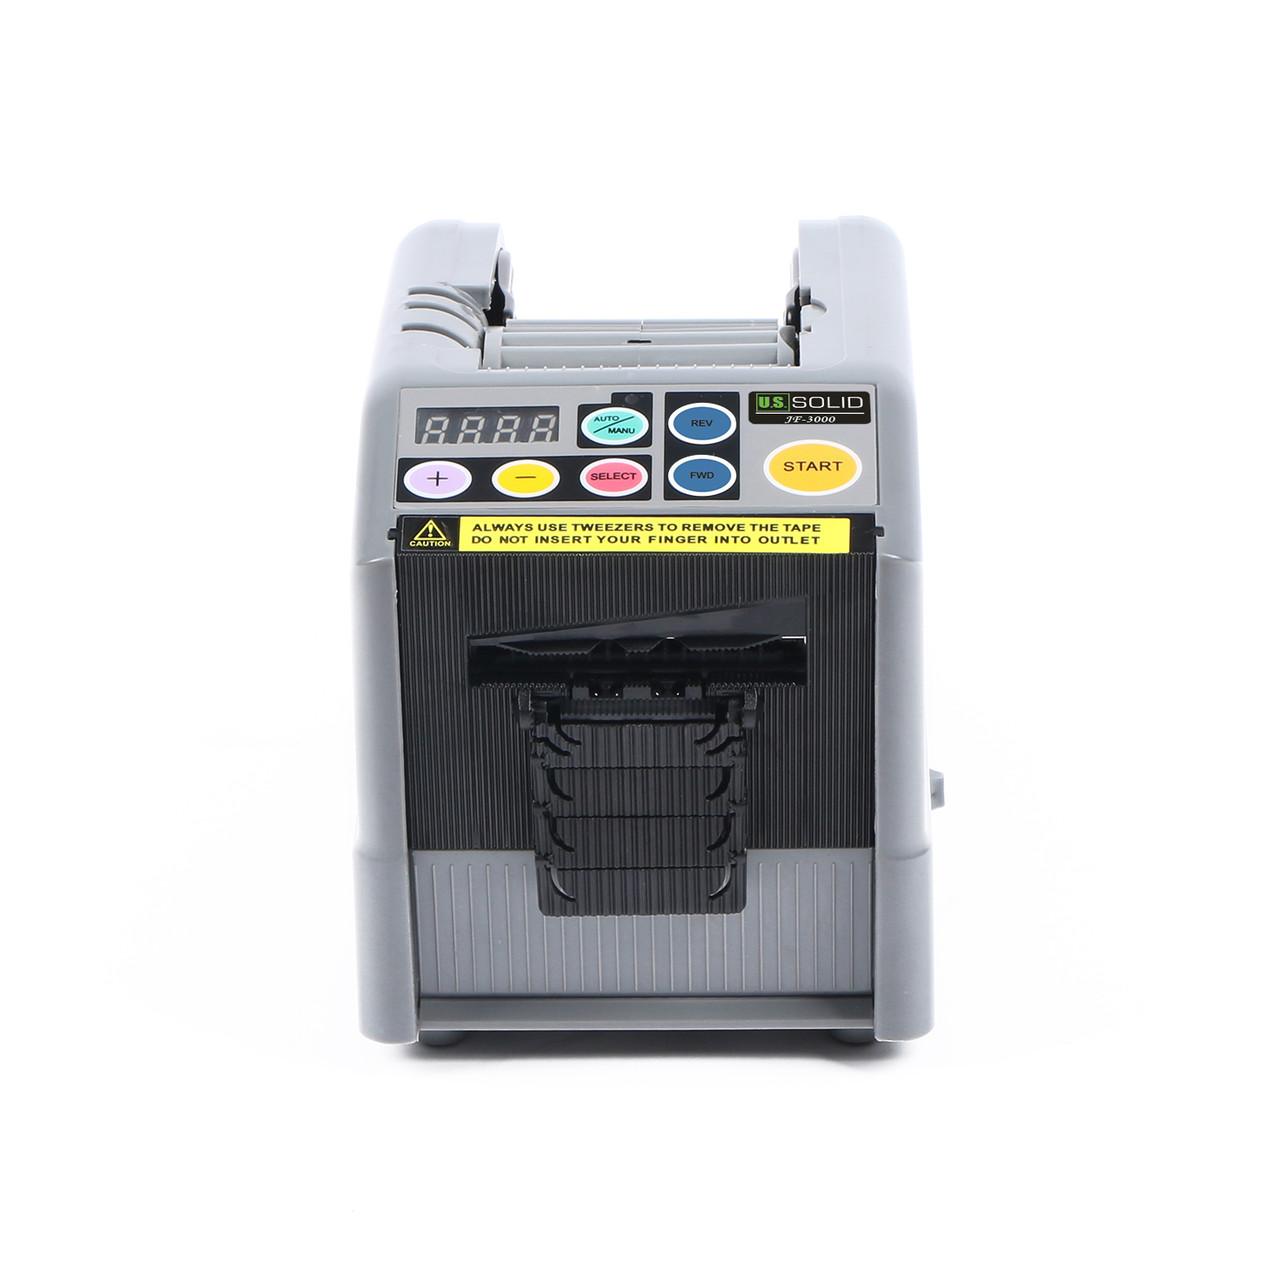 110V Automatic Electric Tape Dispenser Adhesive Cutter Cutting Machine ZCUT-9 US